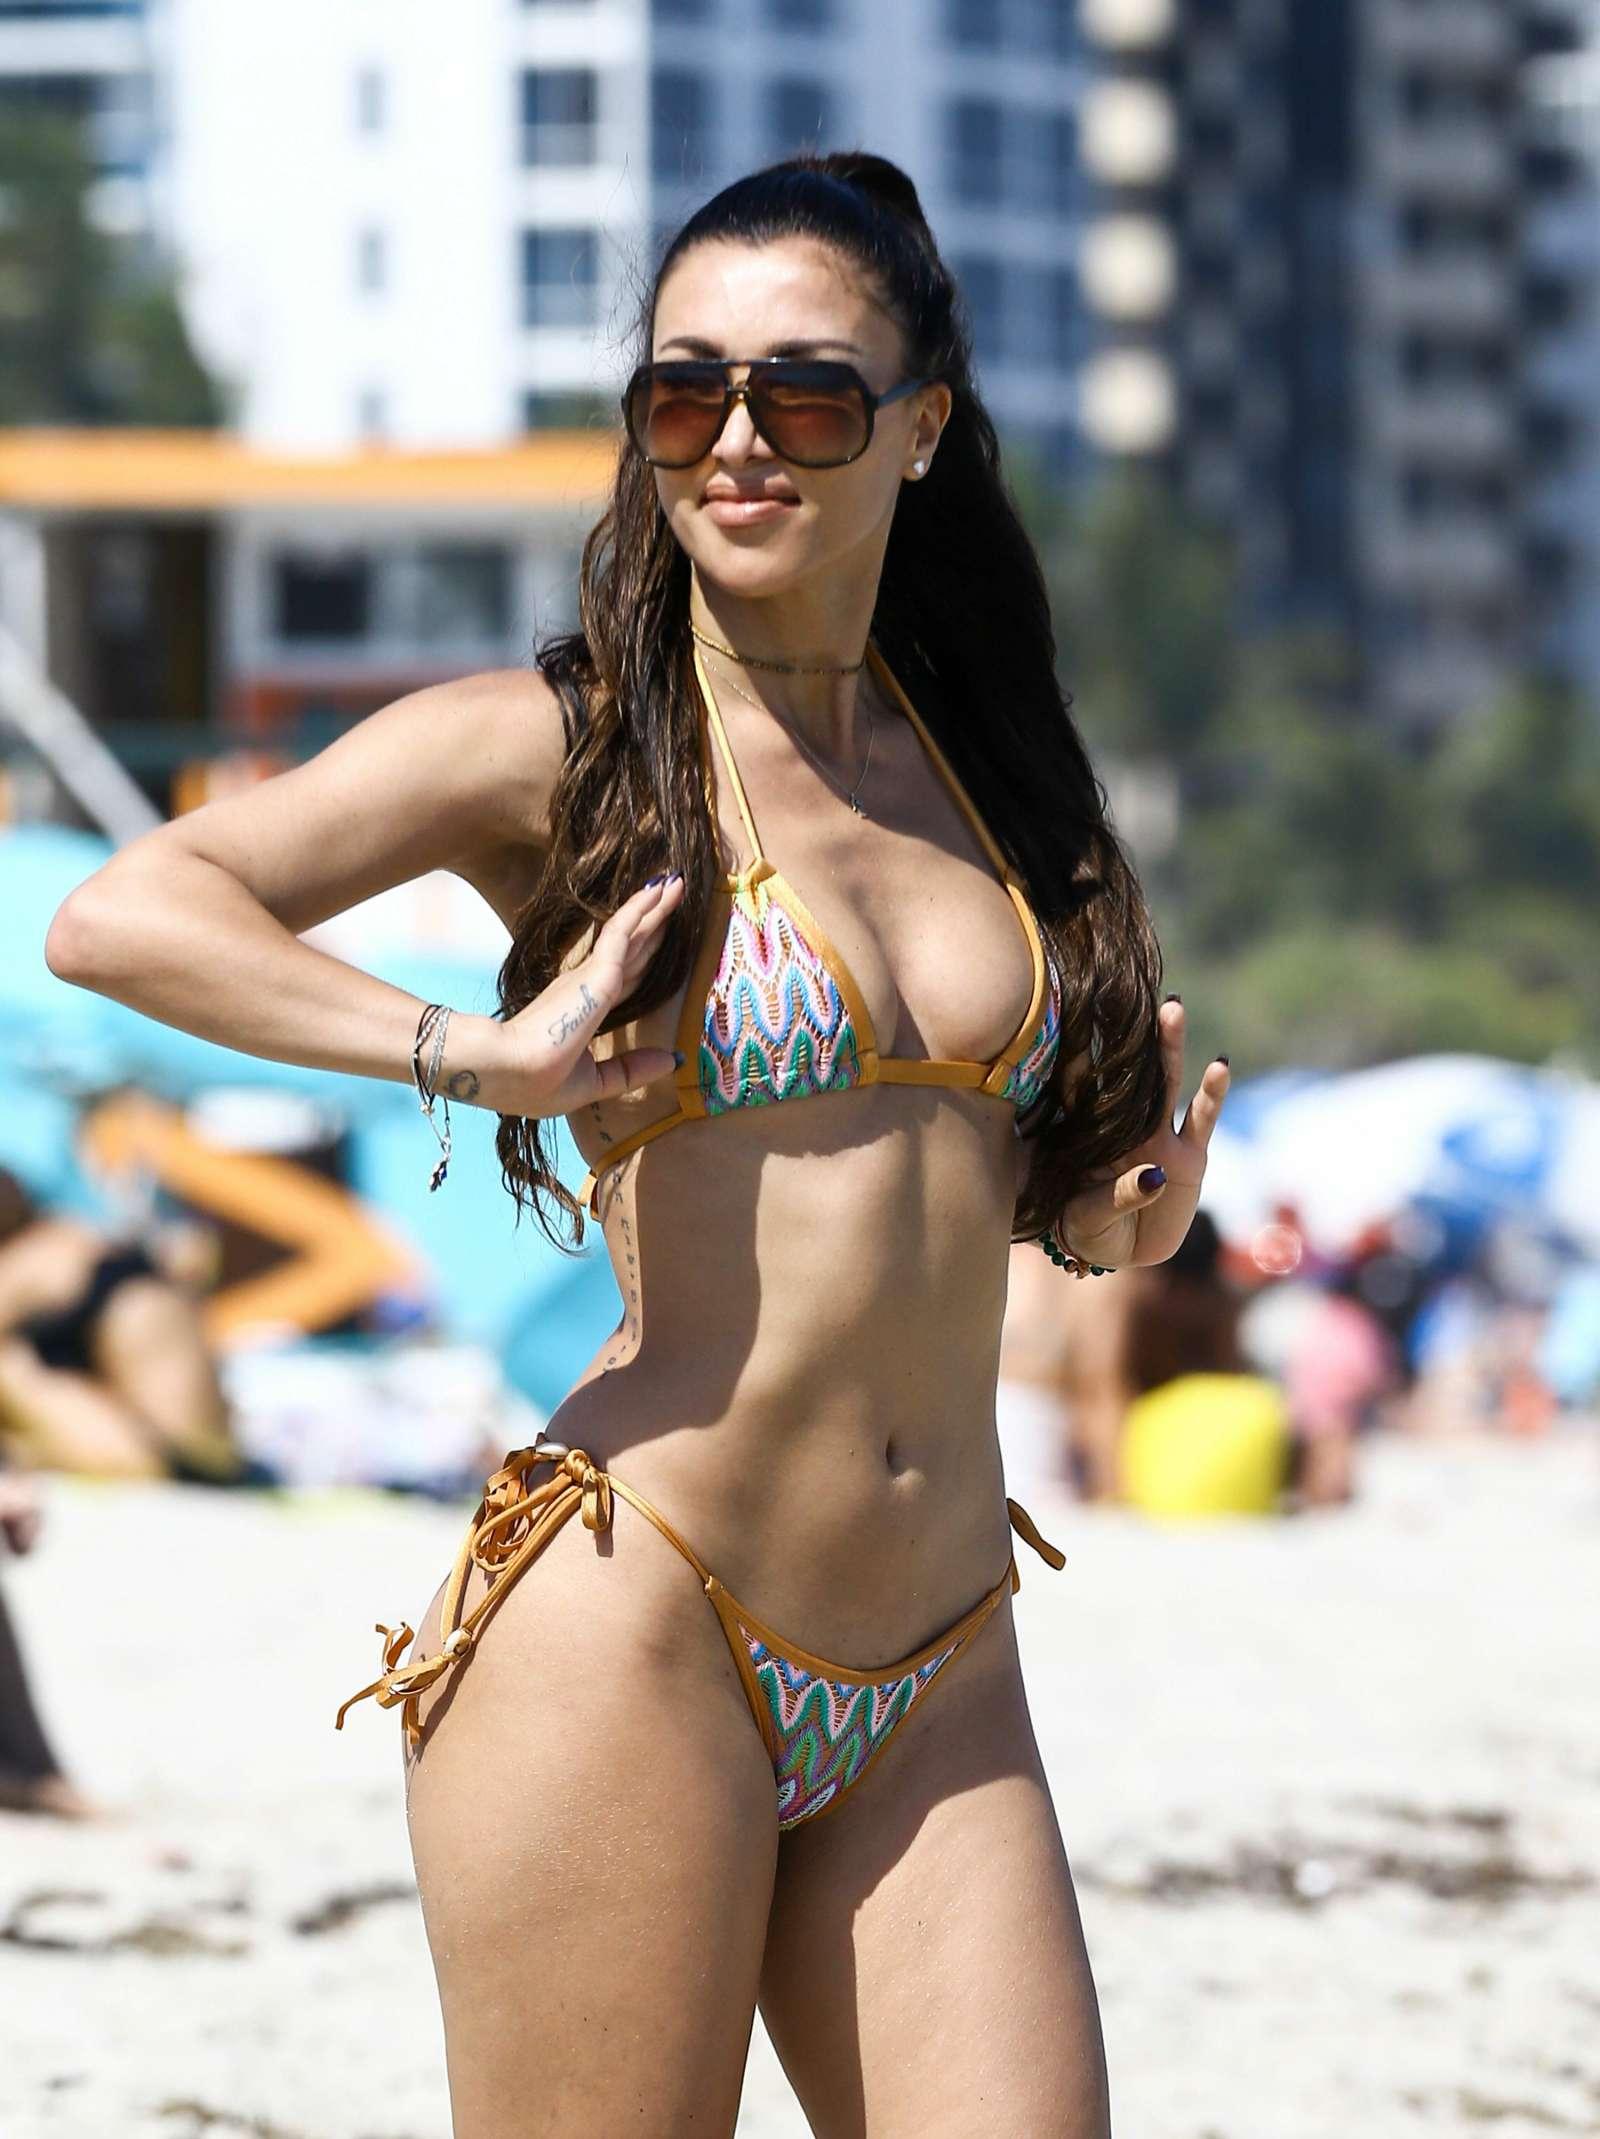 Metisha Schaefer Bikini Photoshoot on Miami Beach Pic 17 of 35